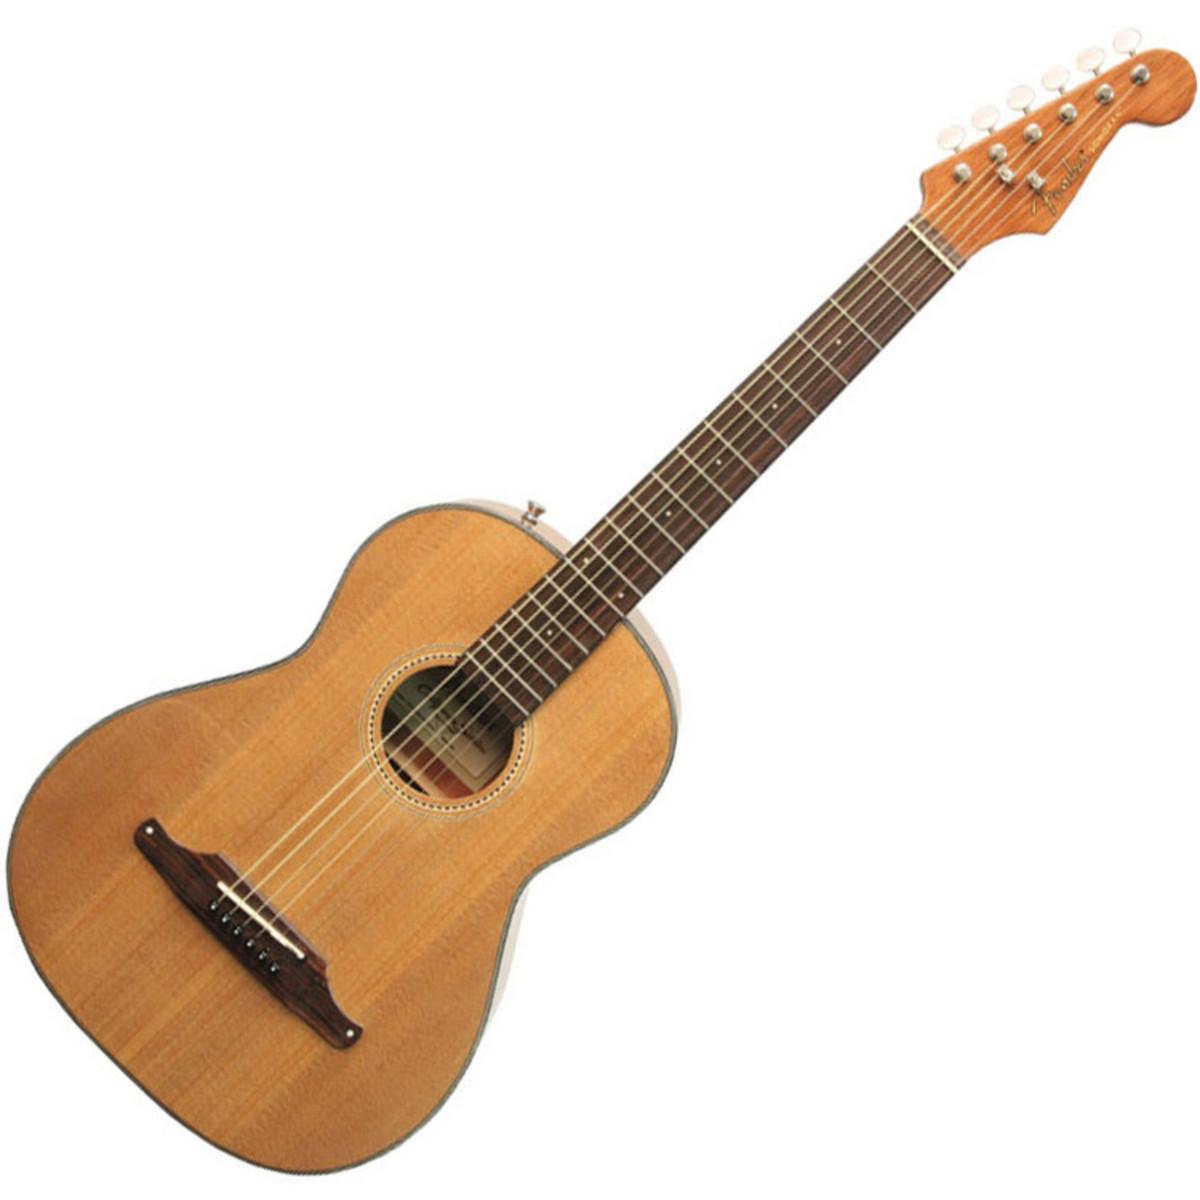 fender guitare acoustique sonoran mini 3 4 natural metallis en housse b stock. Black Bedroom Furniture Sets. Home Design Ideas